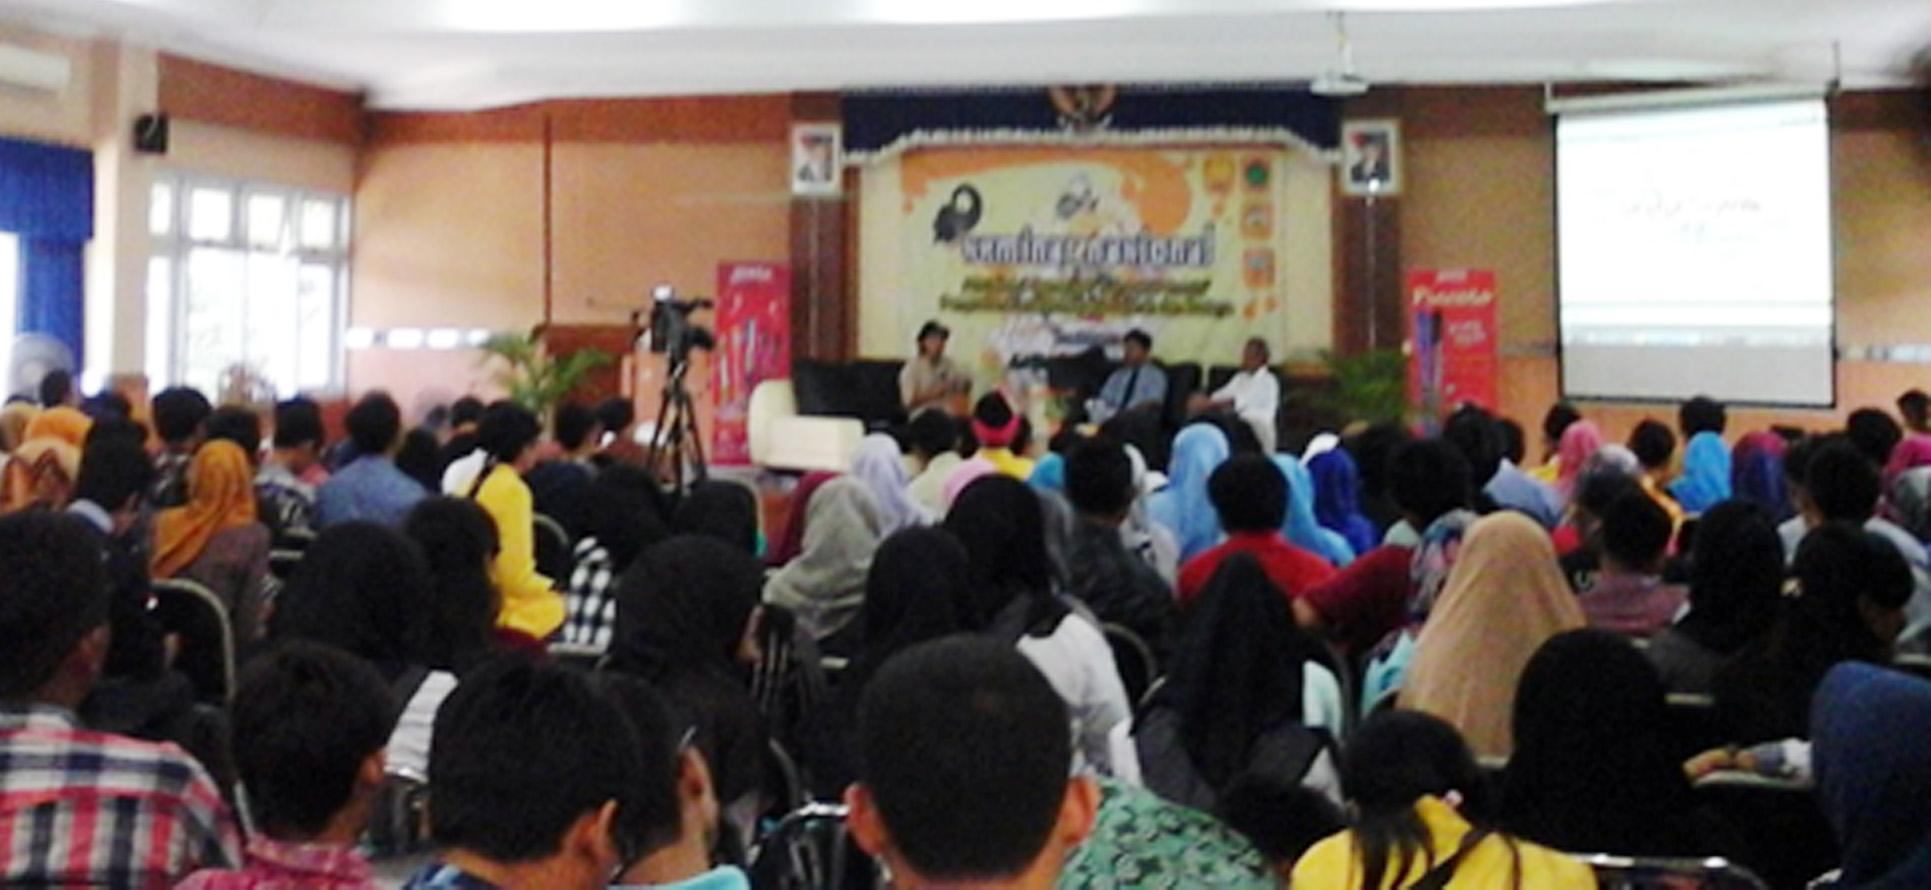 Peringati Sumpah Pemuda, Hima Sejarah Gelar Seminar Nasional